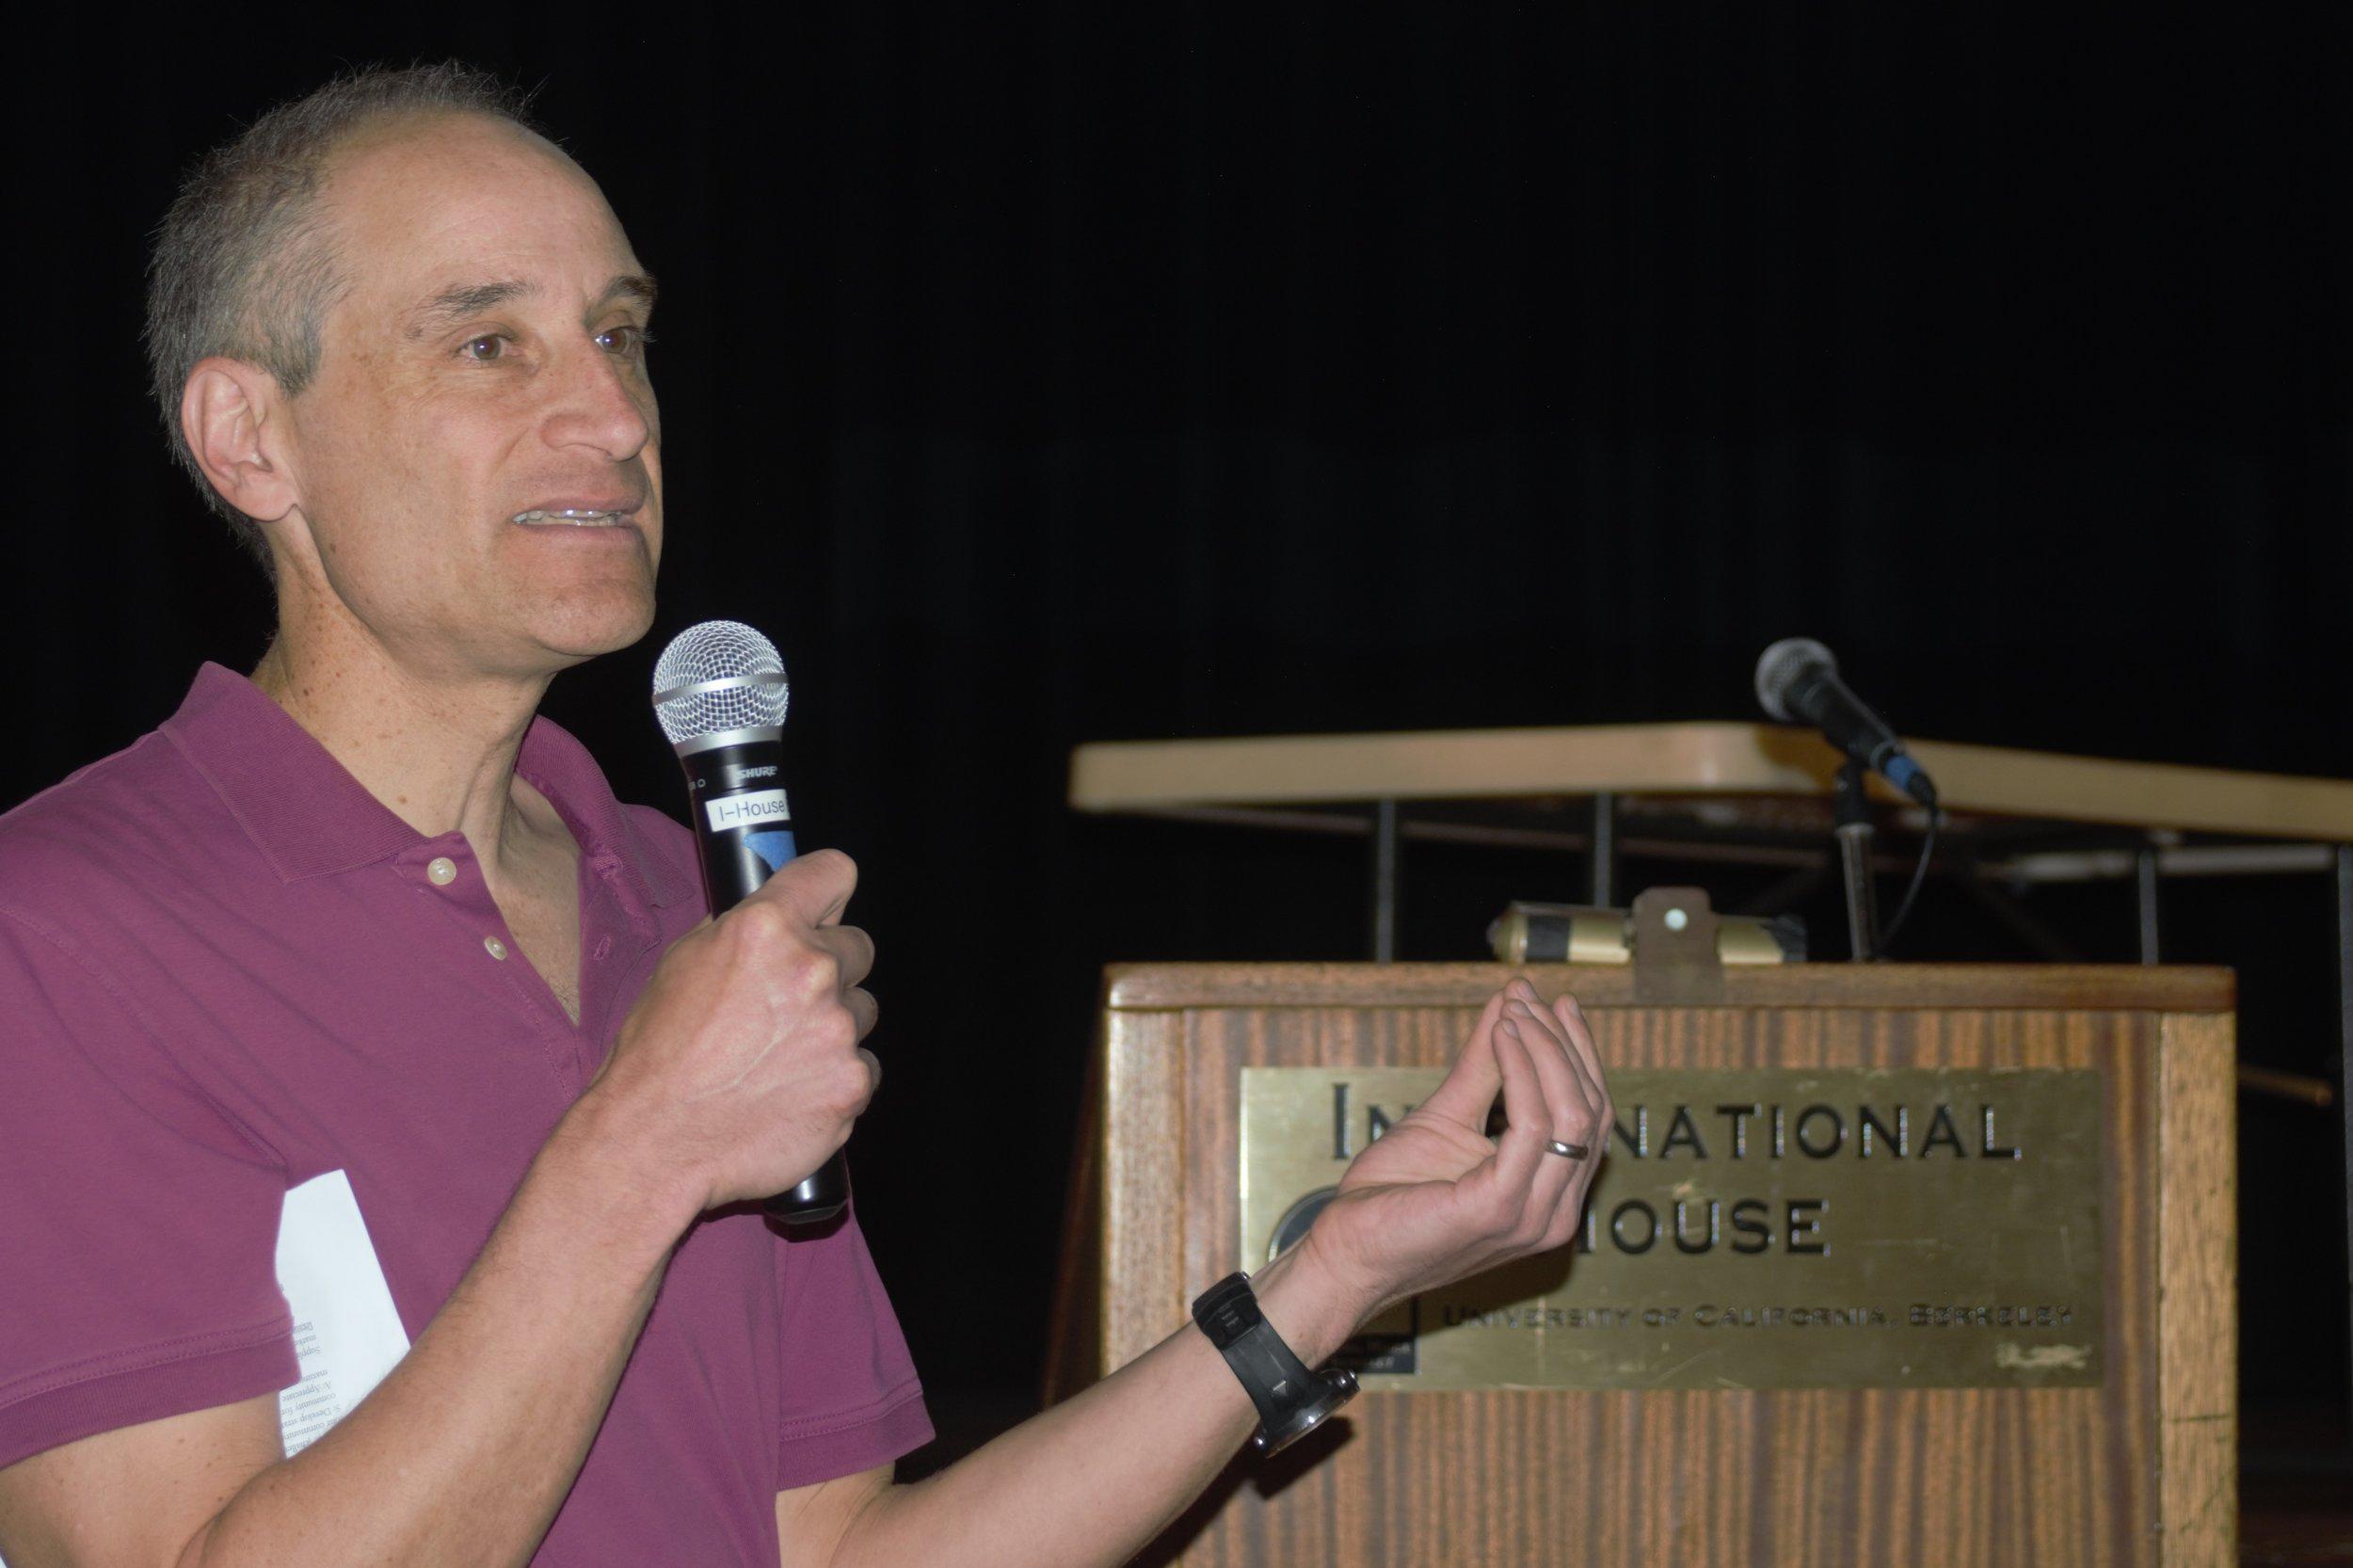 Jason Patent (UCB) facilitating the session on culture shock